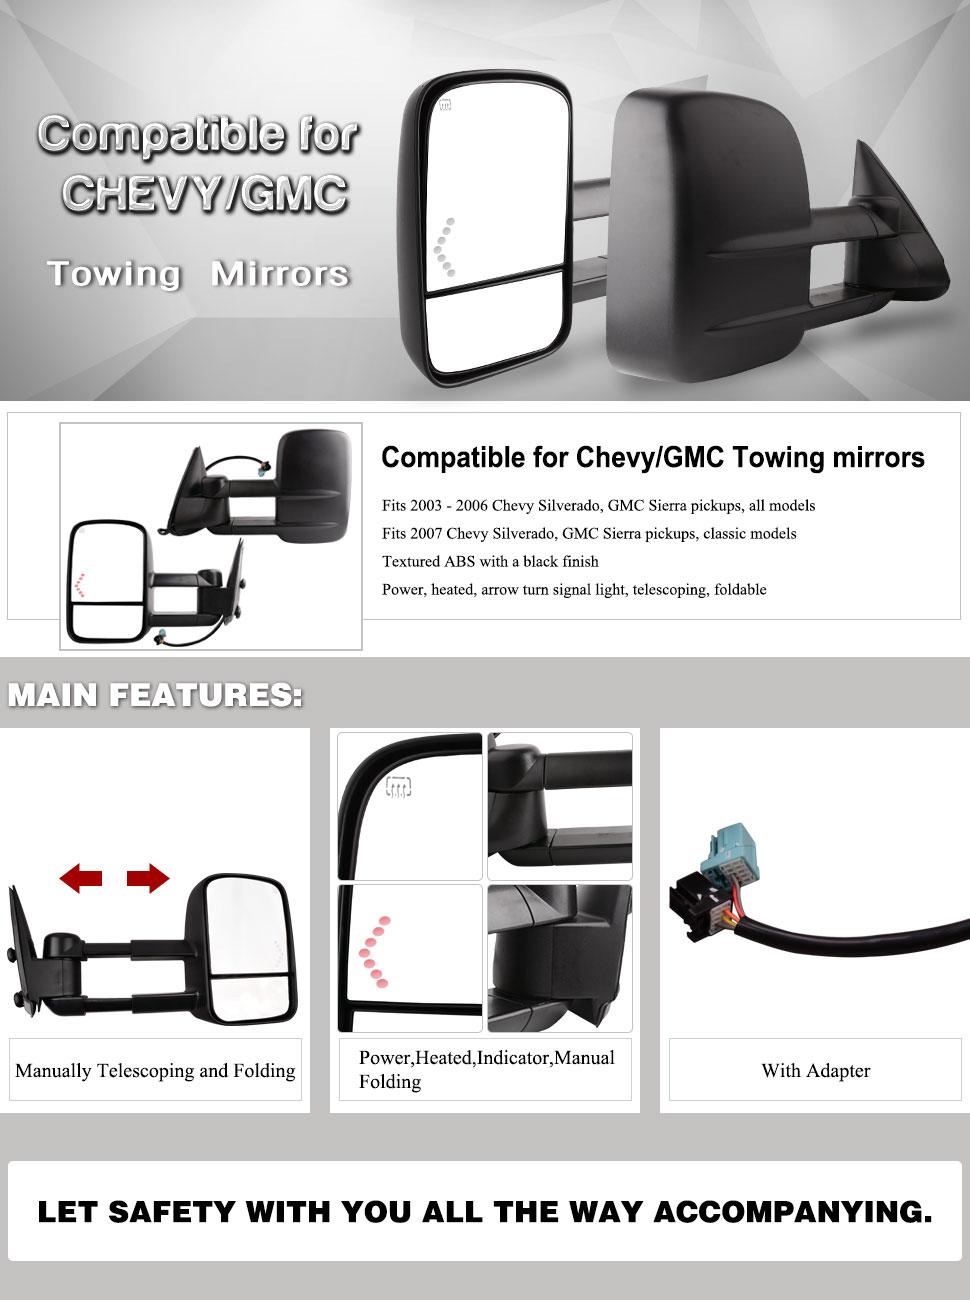 2013 ford super duty wiring schematic 2007 chevy silverado mirror wiring jangan lupa persenannya